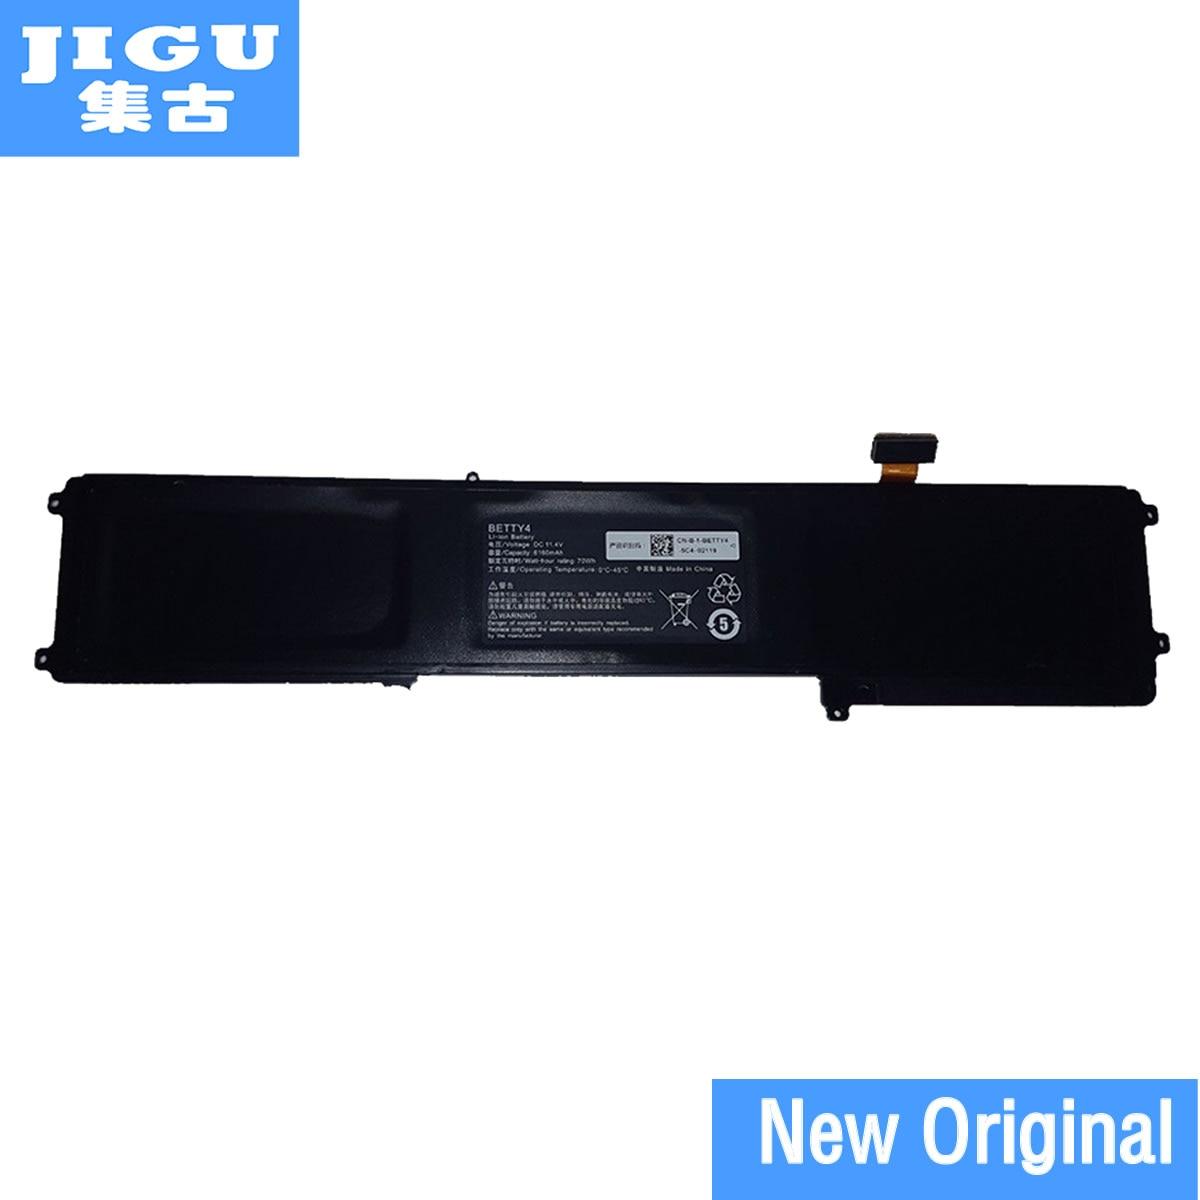 JIGU 11.4V 70WH 3ICP4/56/102-2 3ICP6/87/87/2 BETTY4 F1 Original Laptop Battery forRAZER For Blade 2016 14 RZ09-0166 01952E31 origianl clevo 6 87 n350s 4d7 6 87 n350s 4d8 n350bat 6 n350bat 9 laptop battery